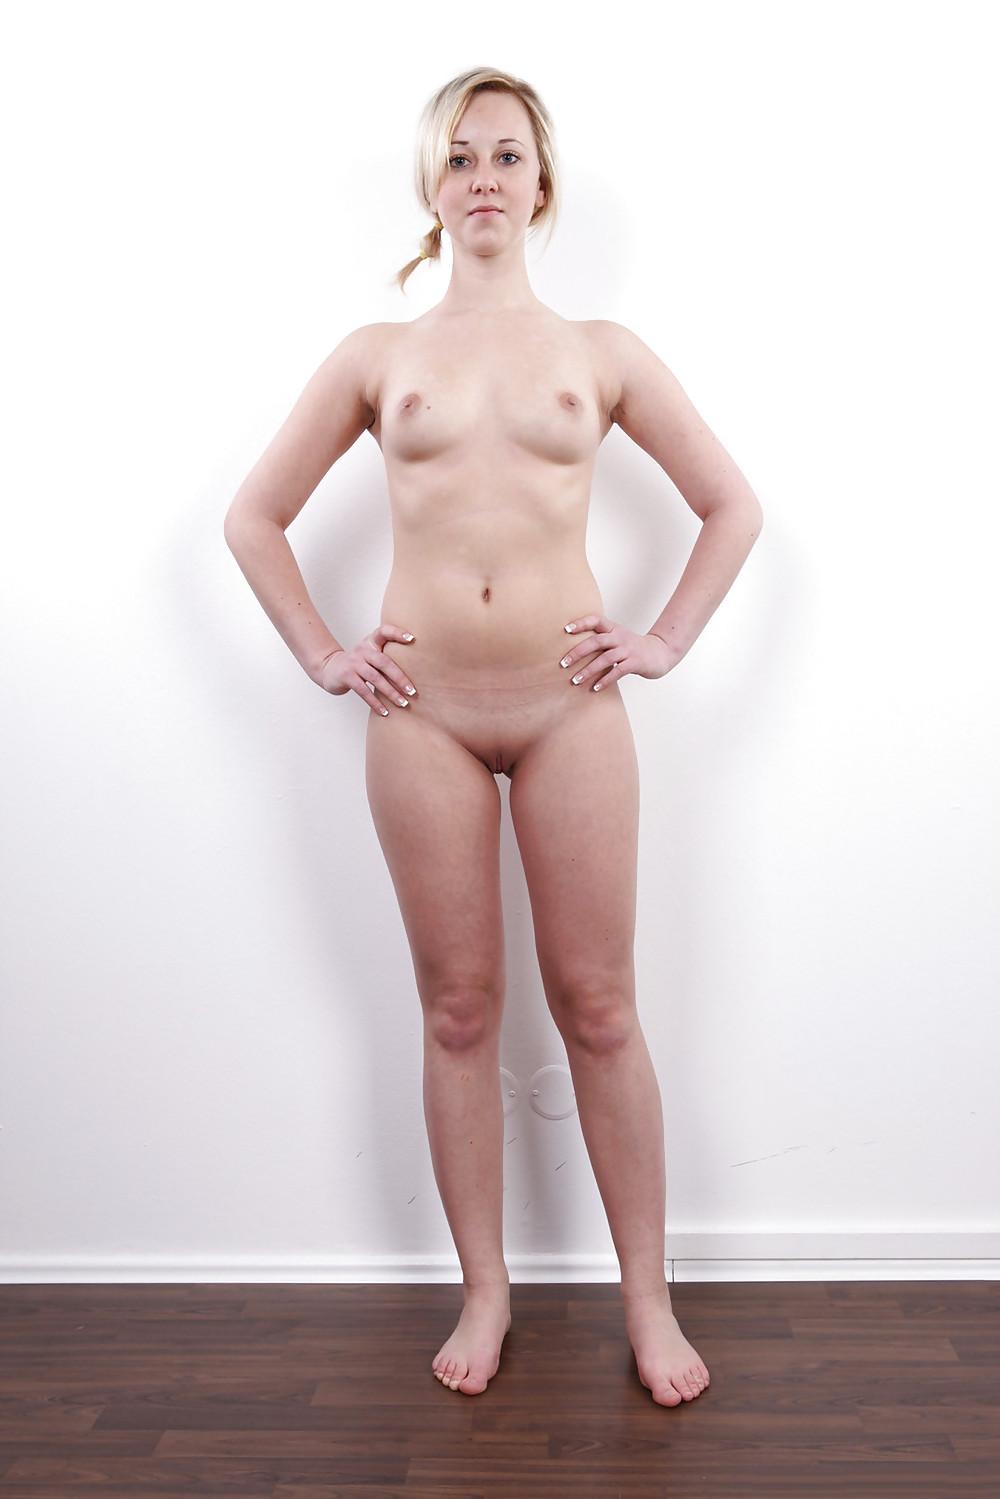 Nude czechs fucking duaghters